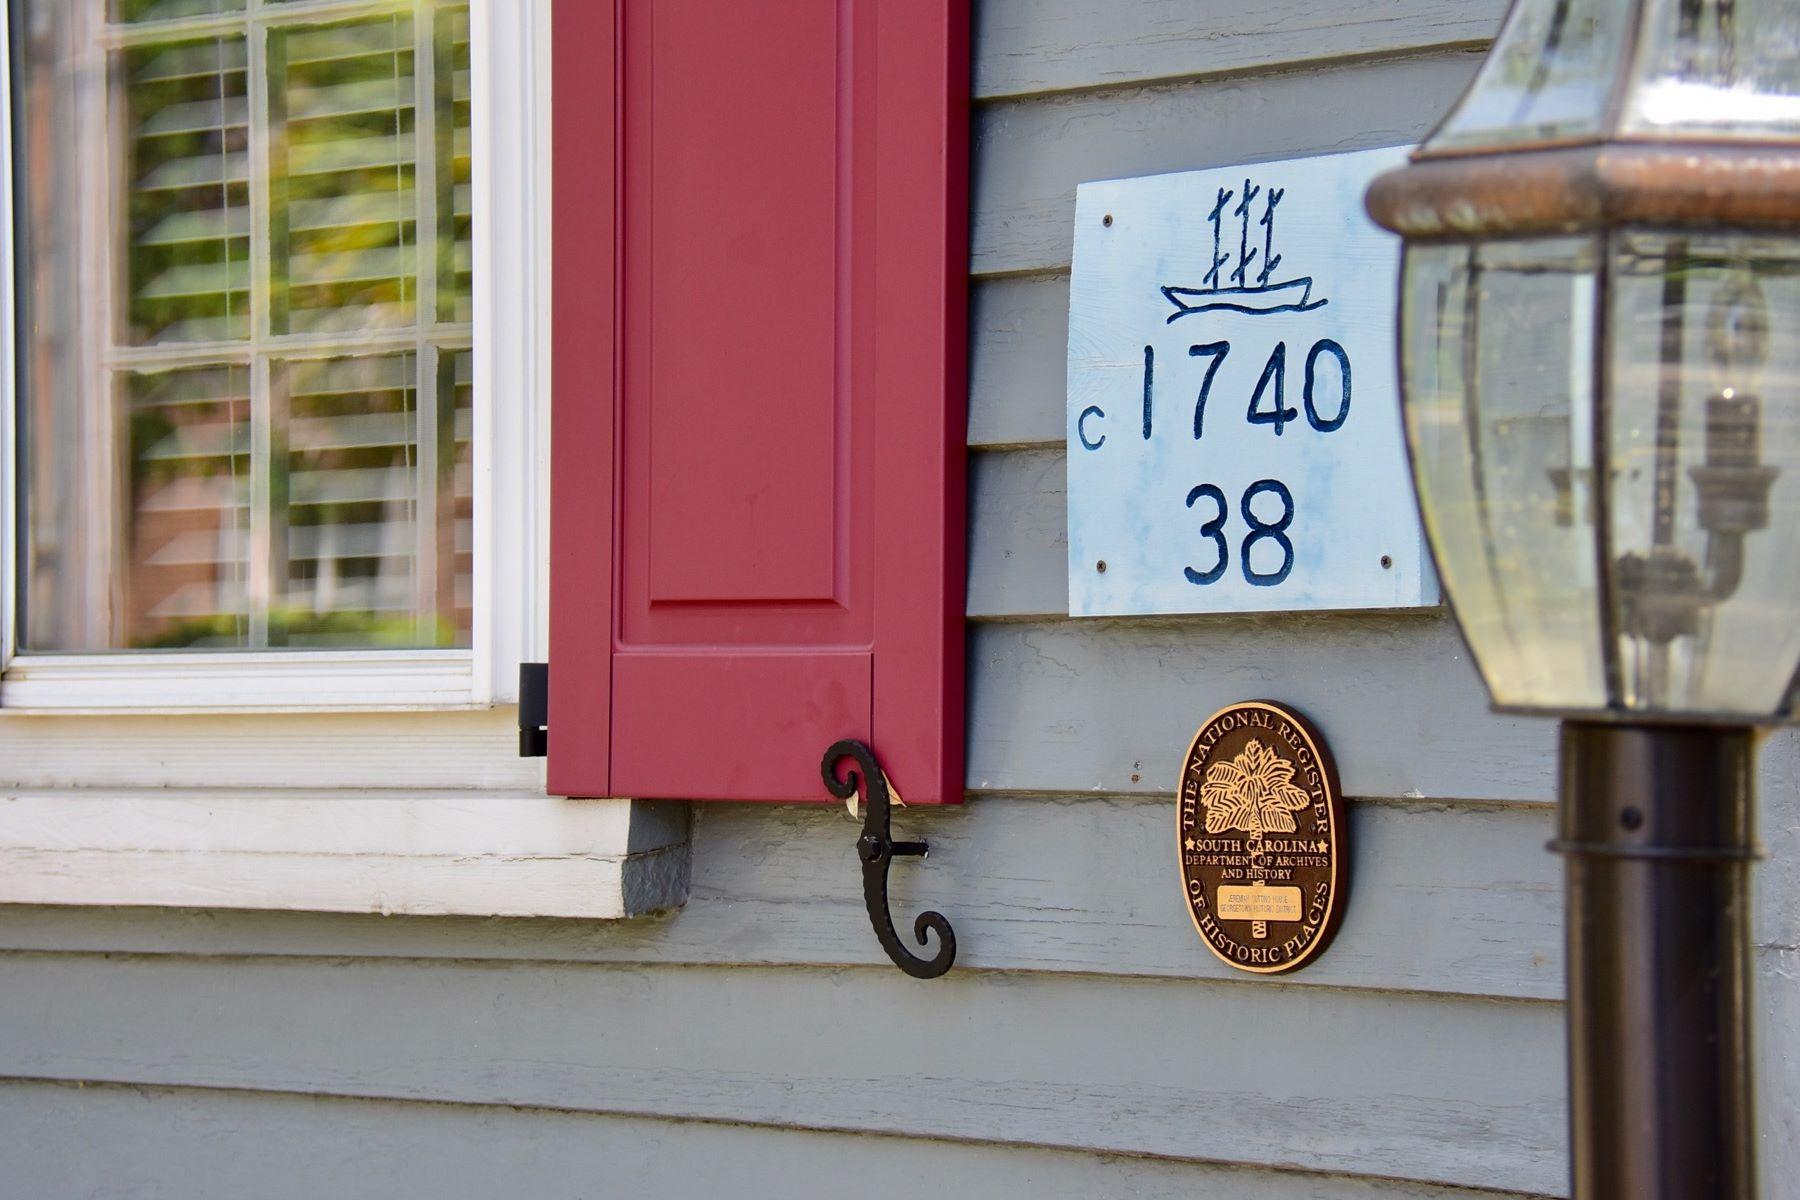 Additional photo for property listing at 702 Prince Street, Georgetown, SC 29440 702  Prince Street Georgetown, South Carolina 29440 United States